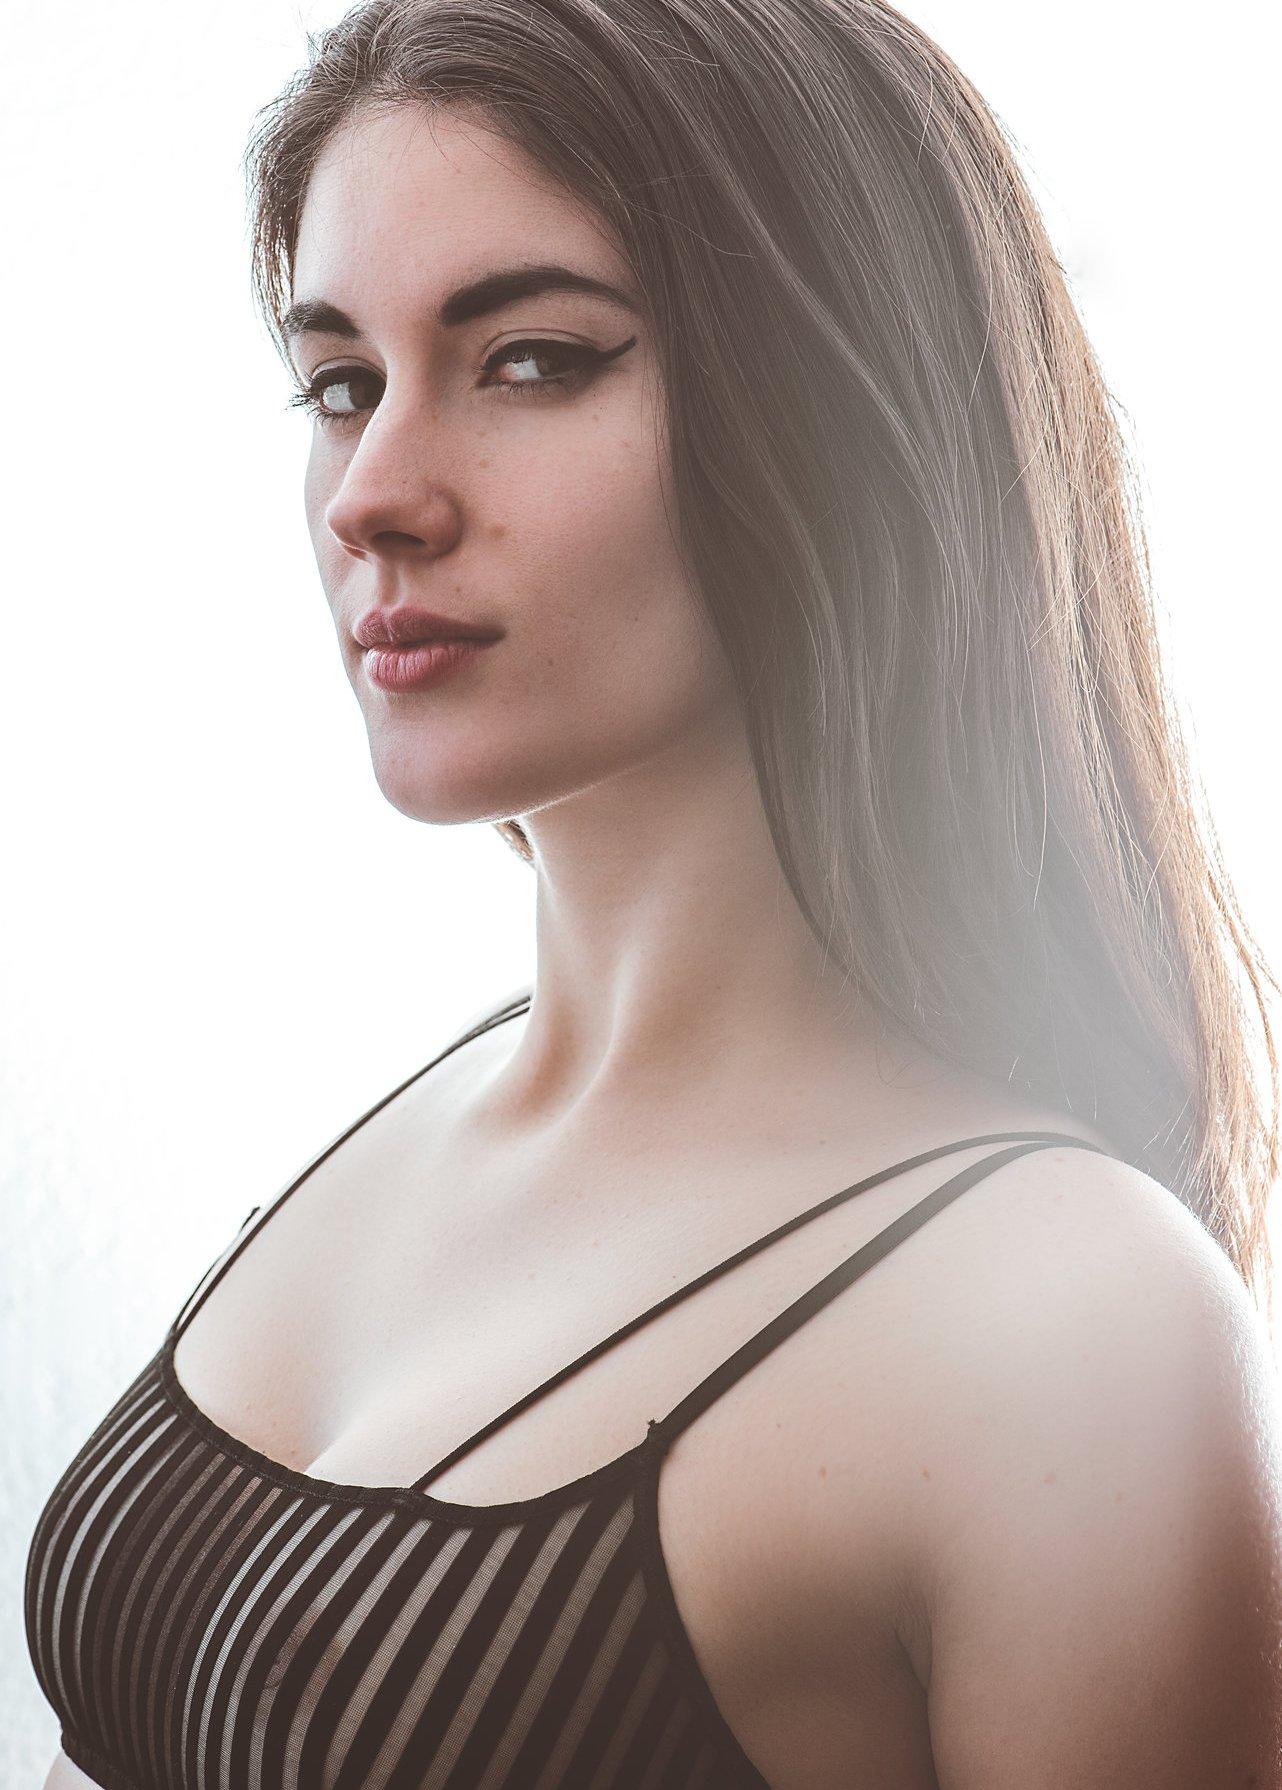 Bella Donna Bellatrixortreat Nudes Leaks 0015